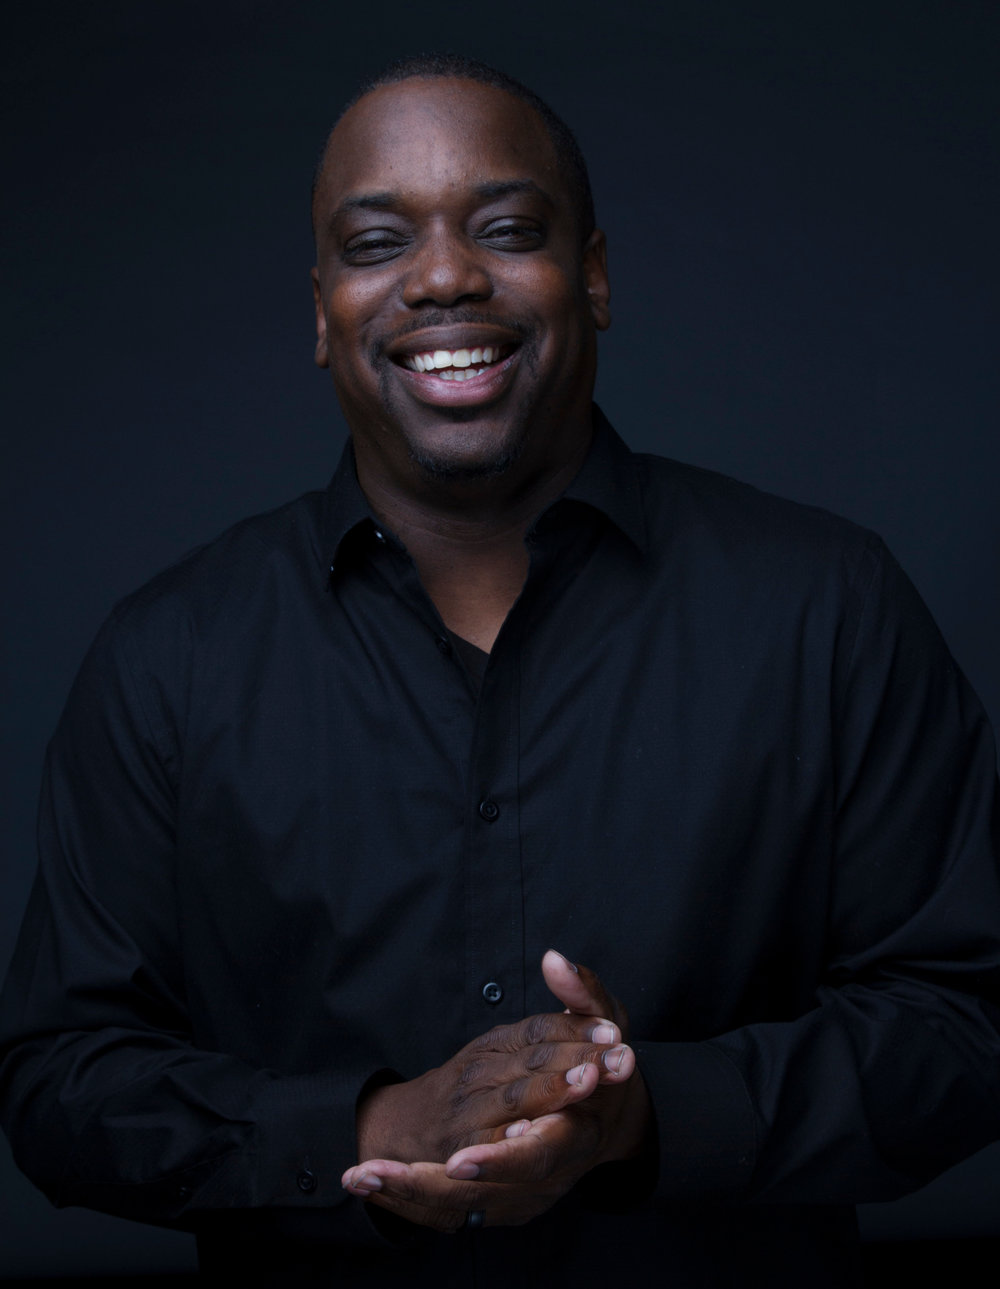 Guest Speaker Matthew Head - Emmy Award-winning Composer